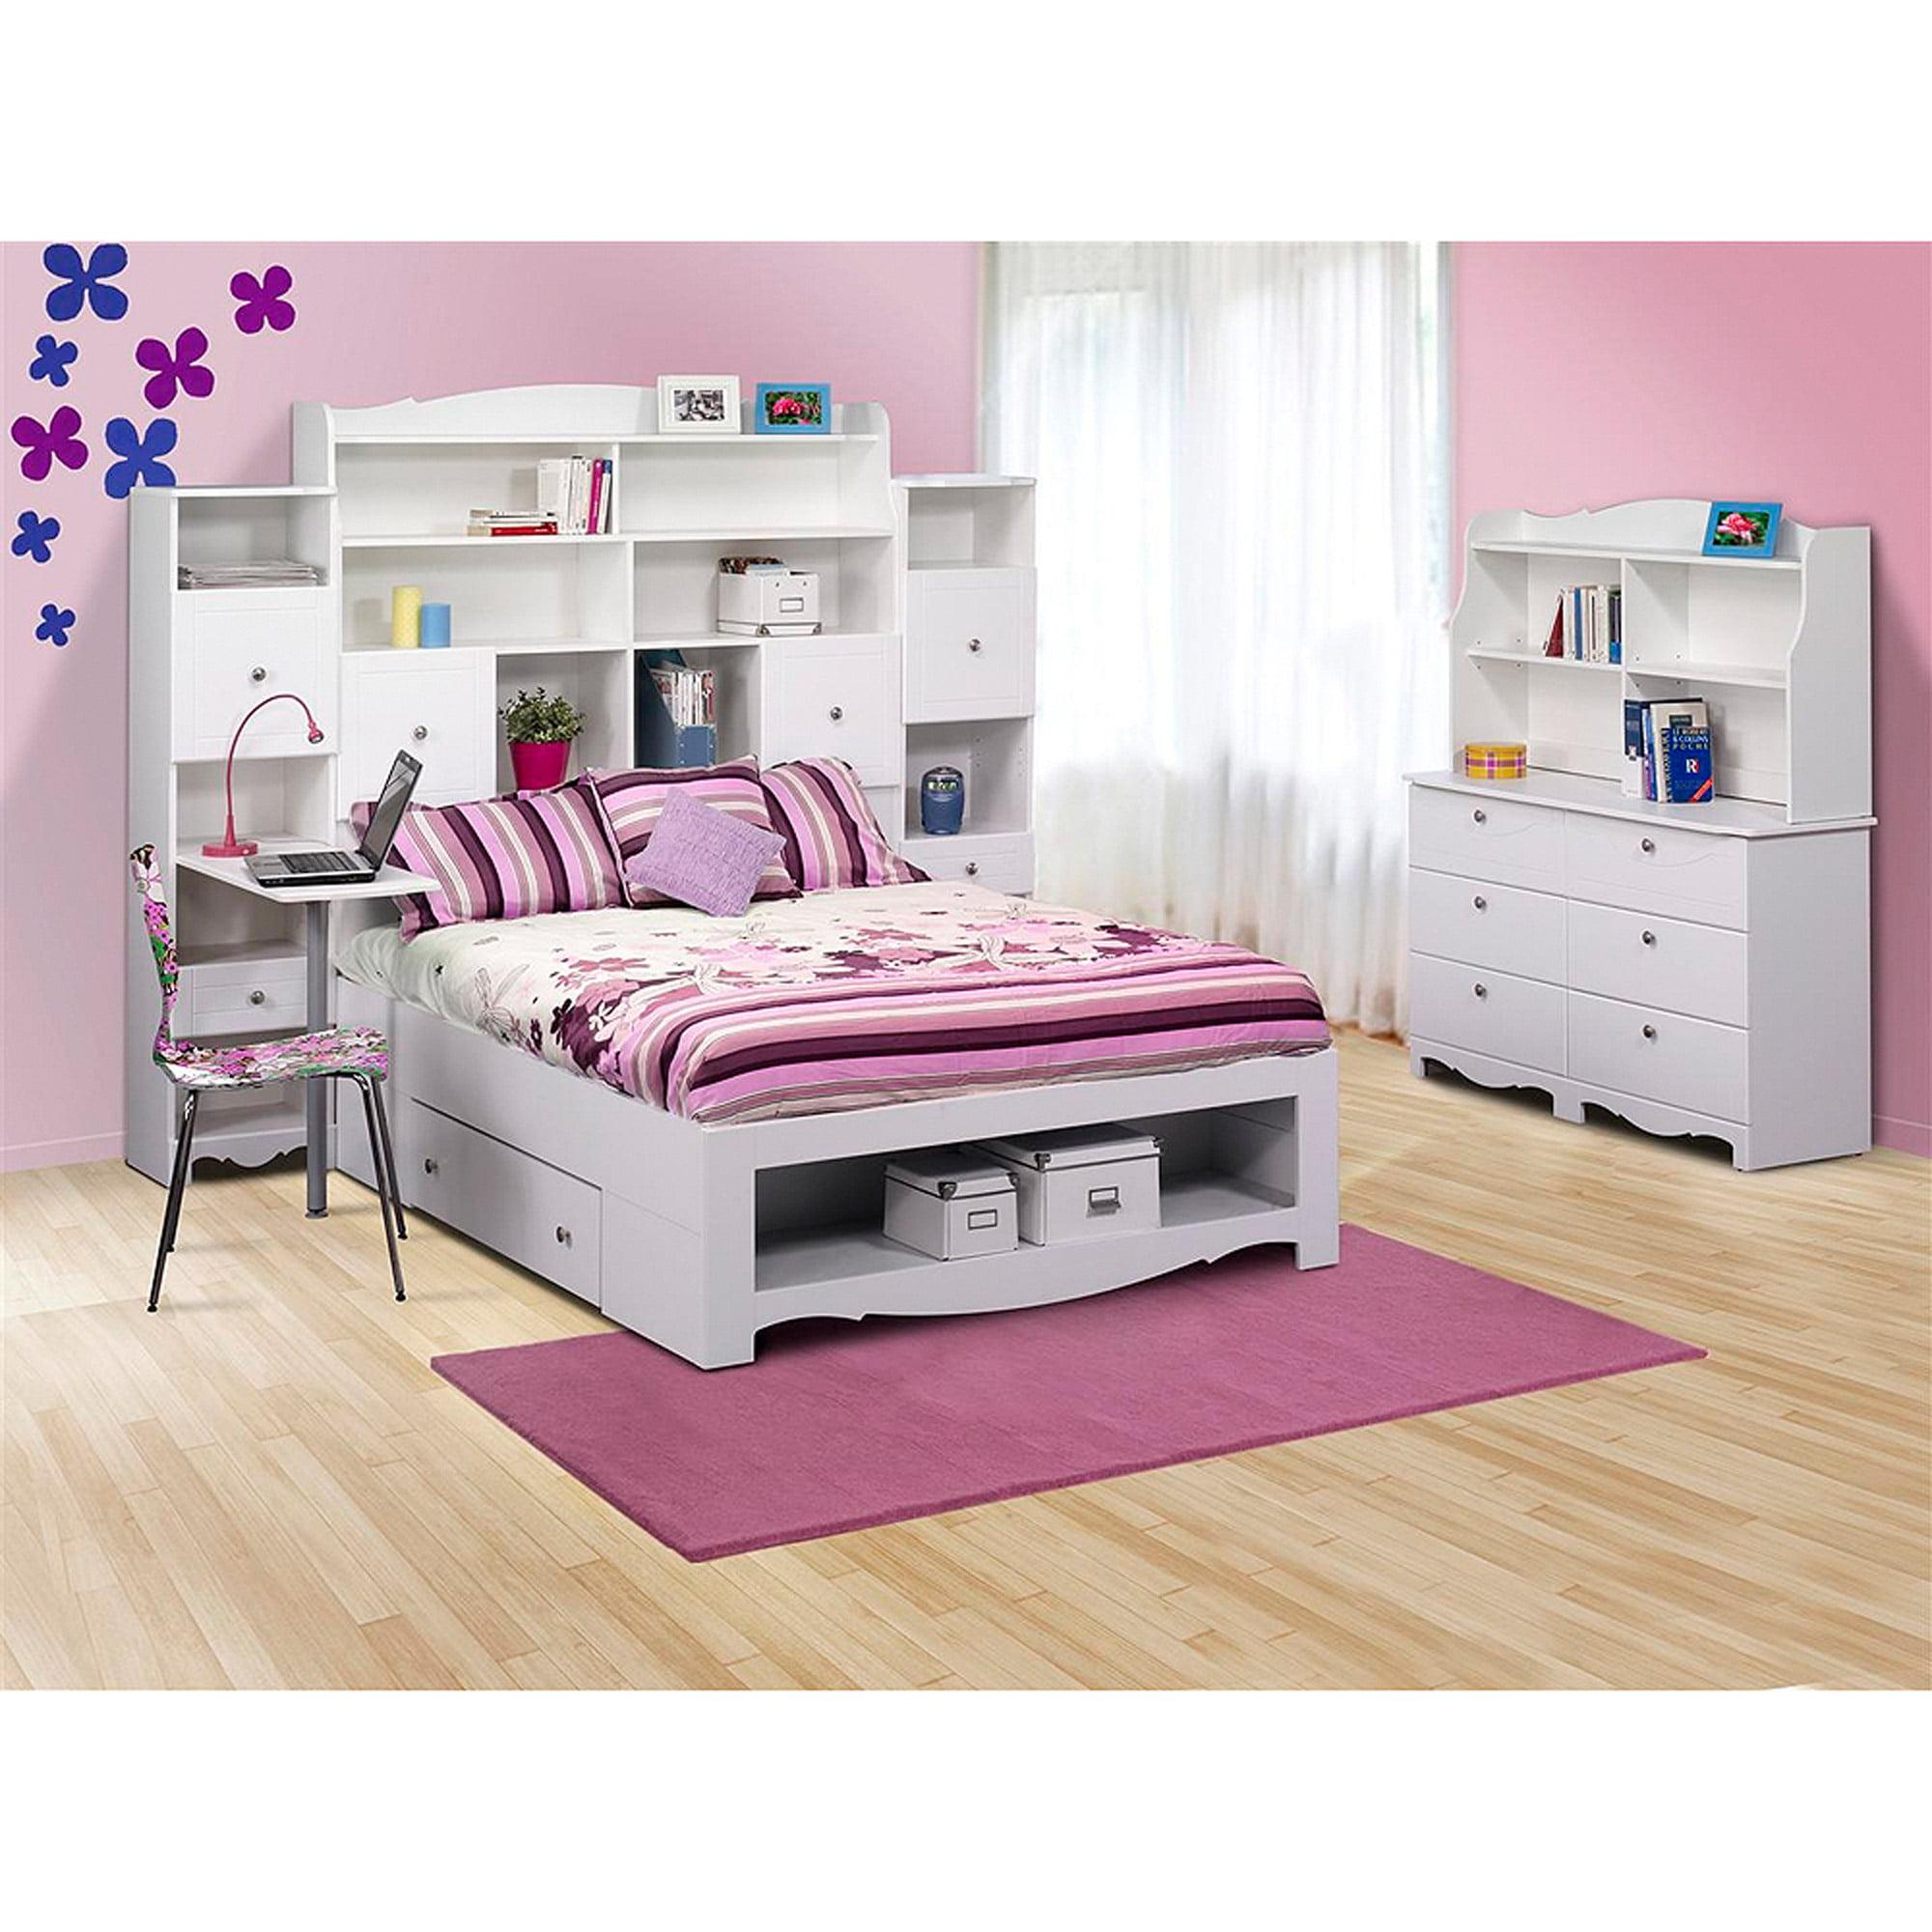 Nexera 315403 Dixie Pixel 2 Drawer Storage Bed  Full  White   Walmart com. Nexera 315403 Dixie Pixel 2 Drawer Storage Bed  Full  White